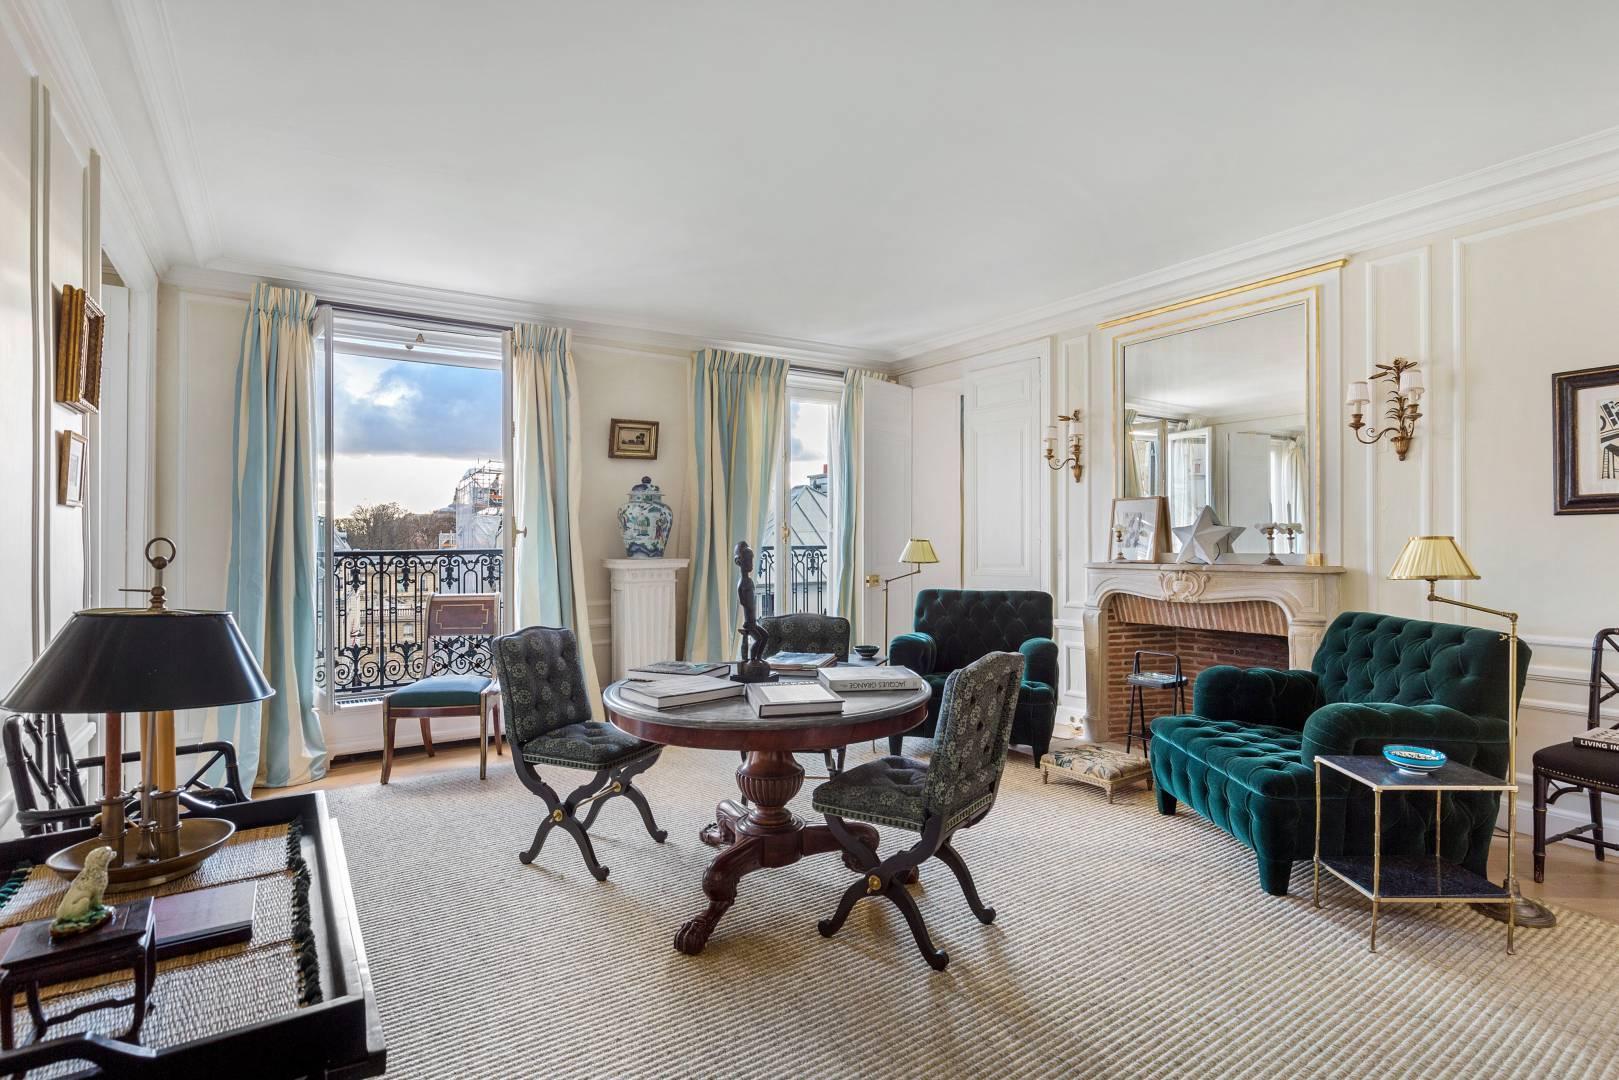 The former flat of Inès de la Fressange is for sale